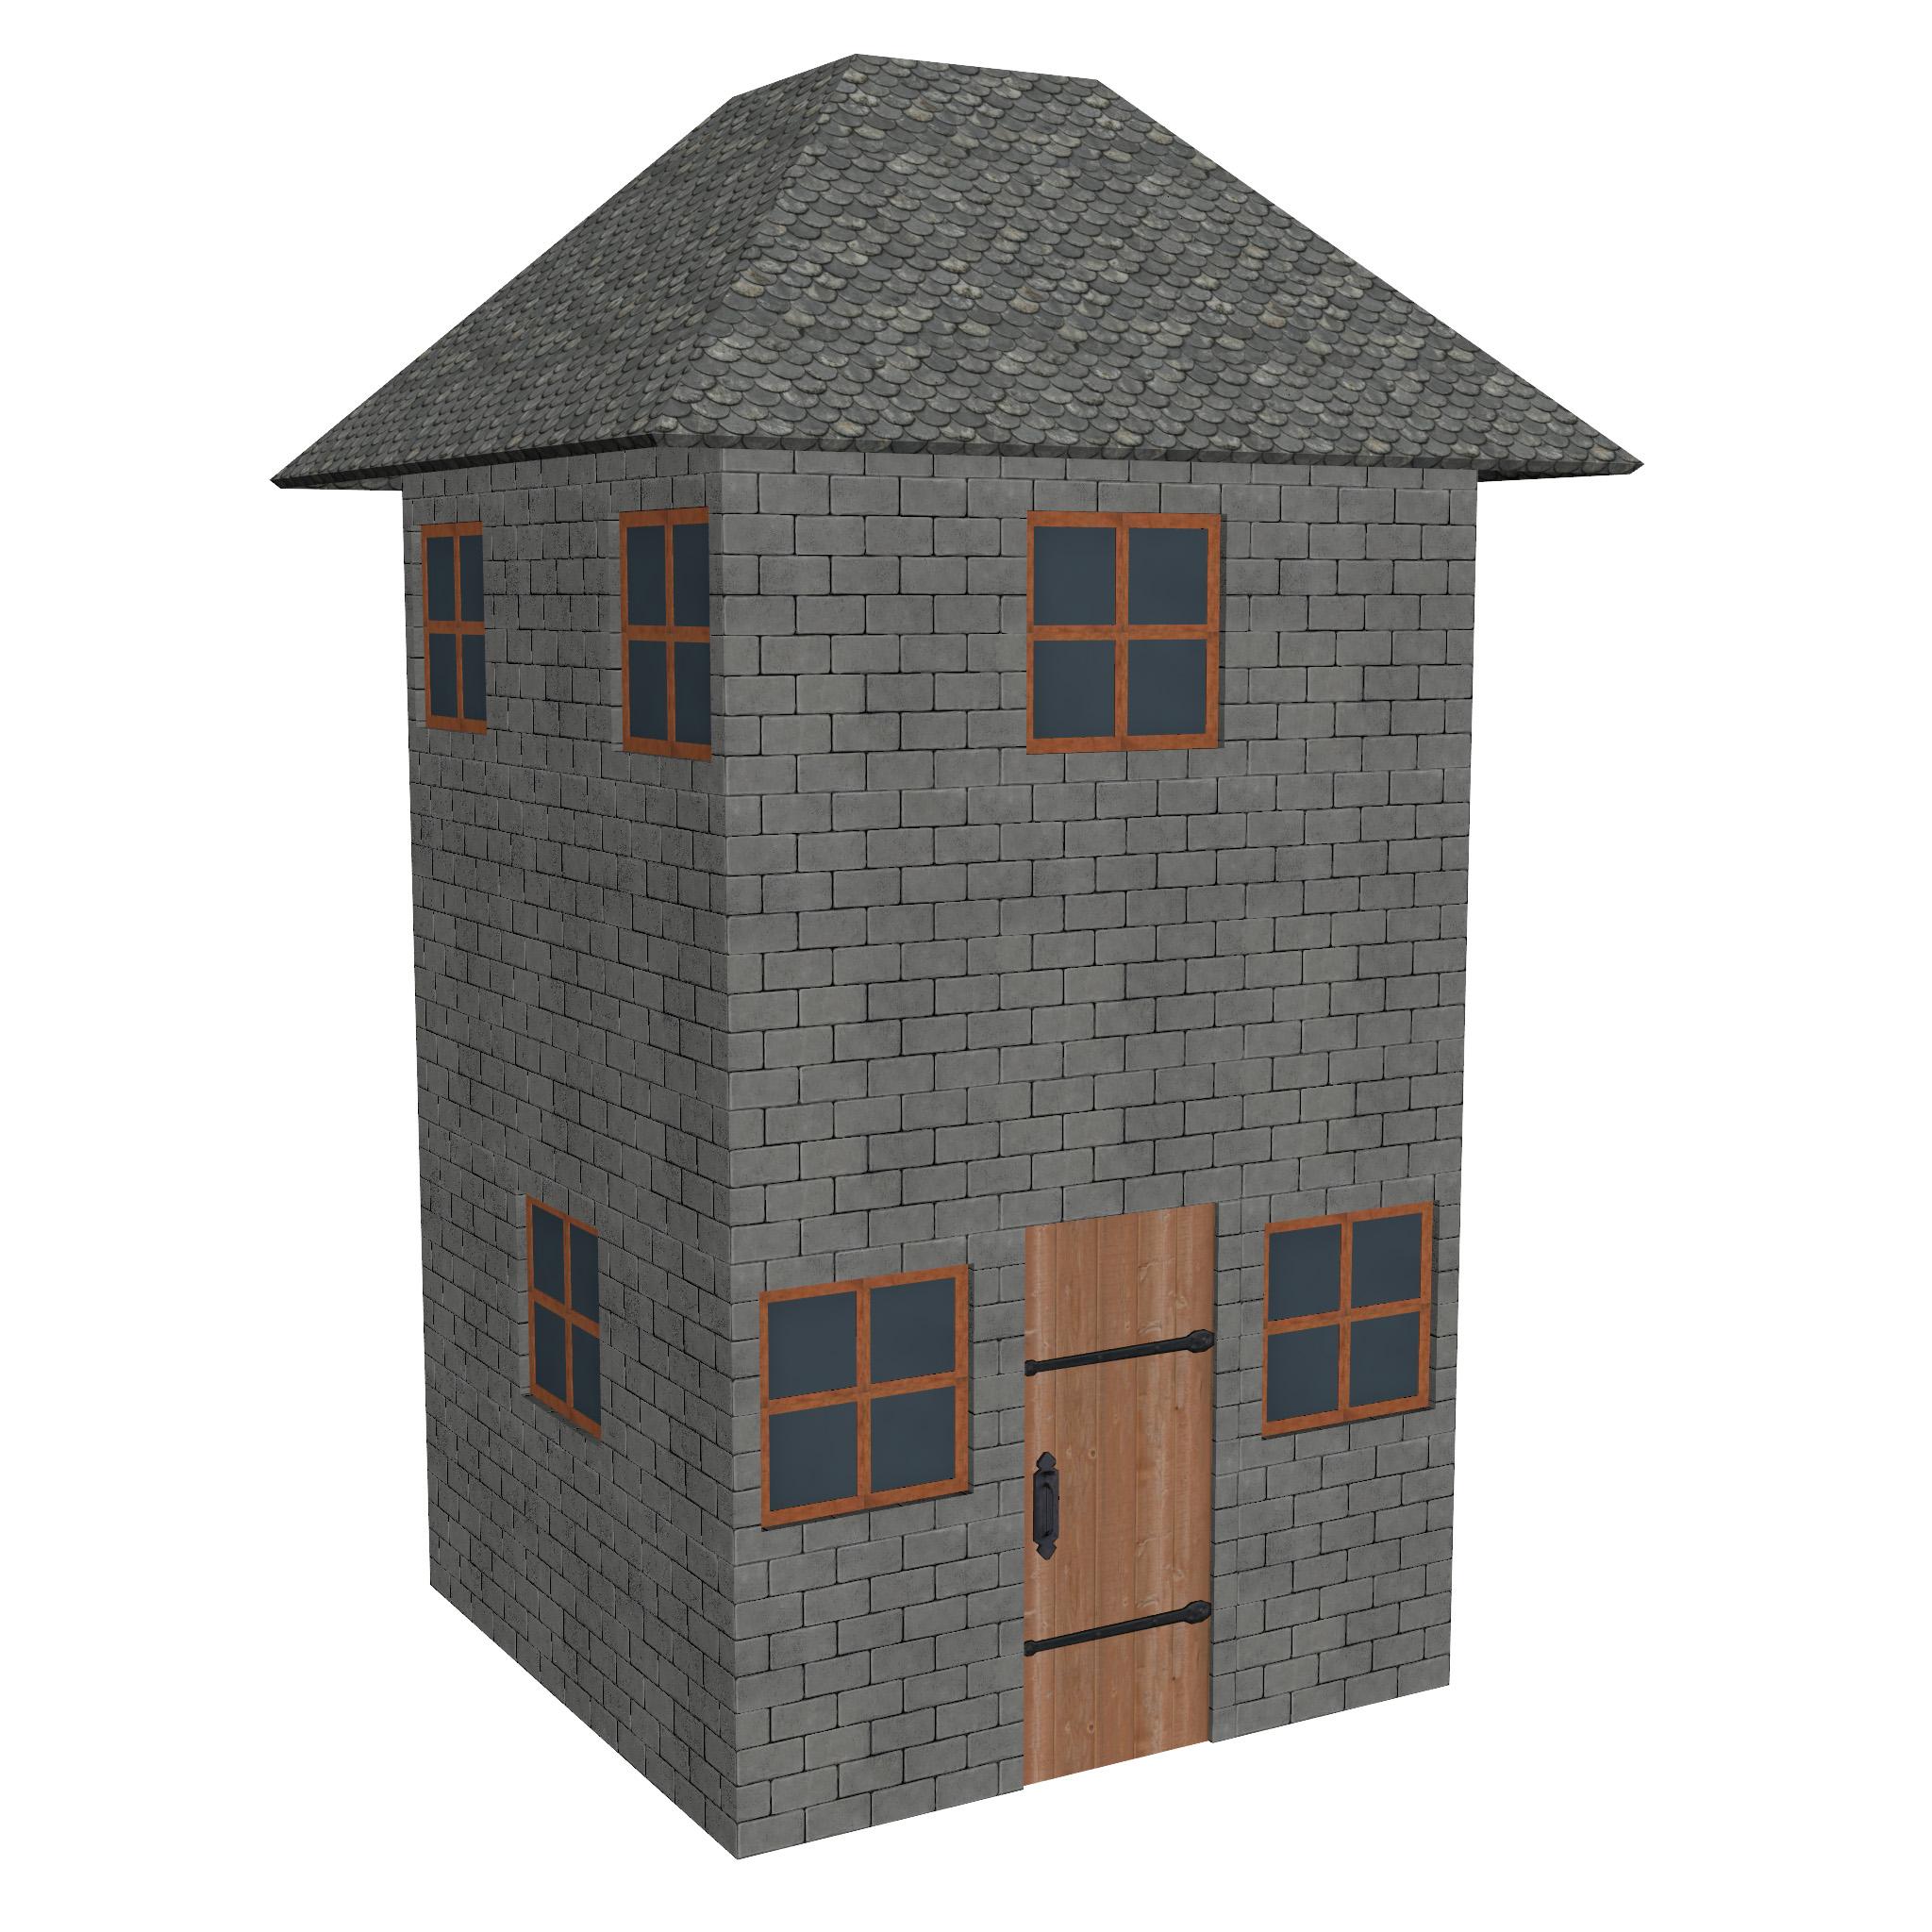 modular brick house set 3d model fbx ma mb 271406